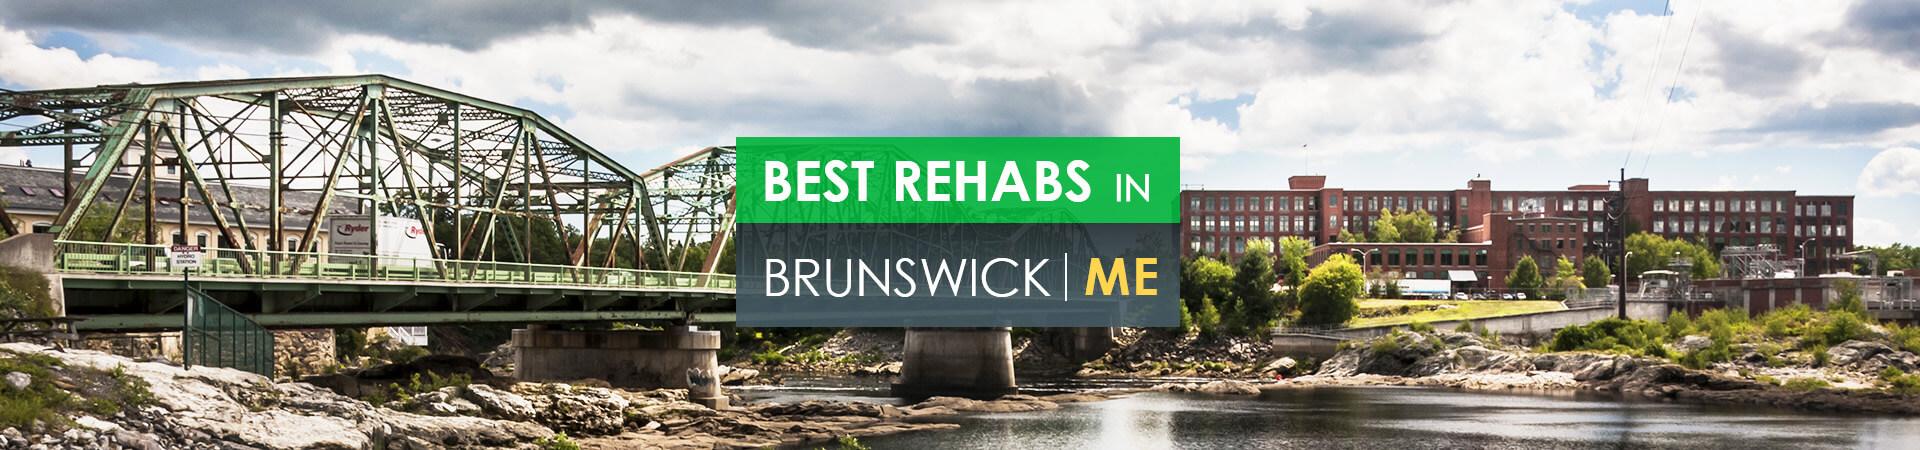 Best rehabs in Brunswick, ME